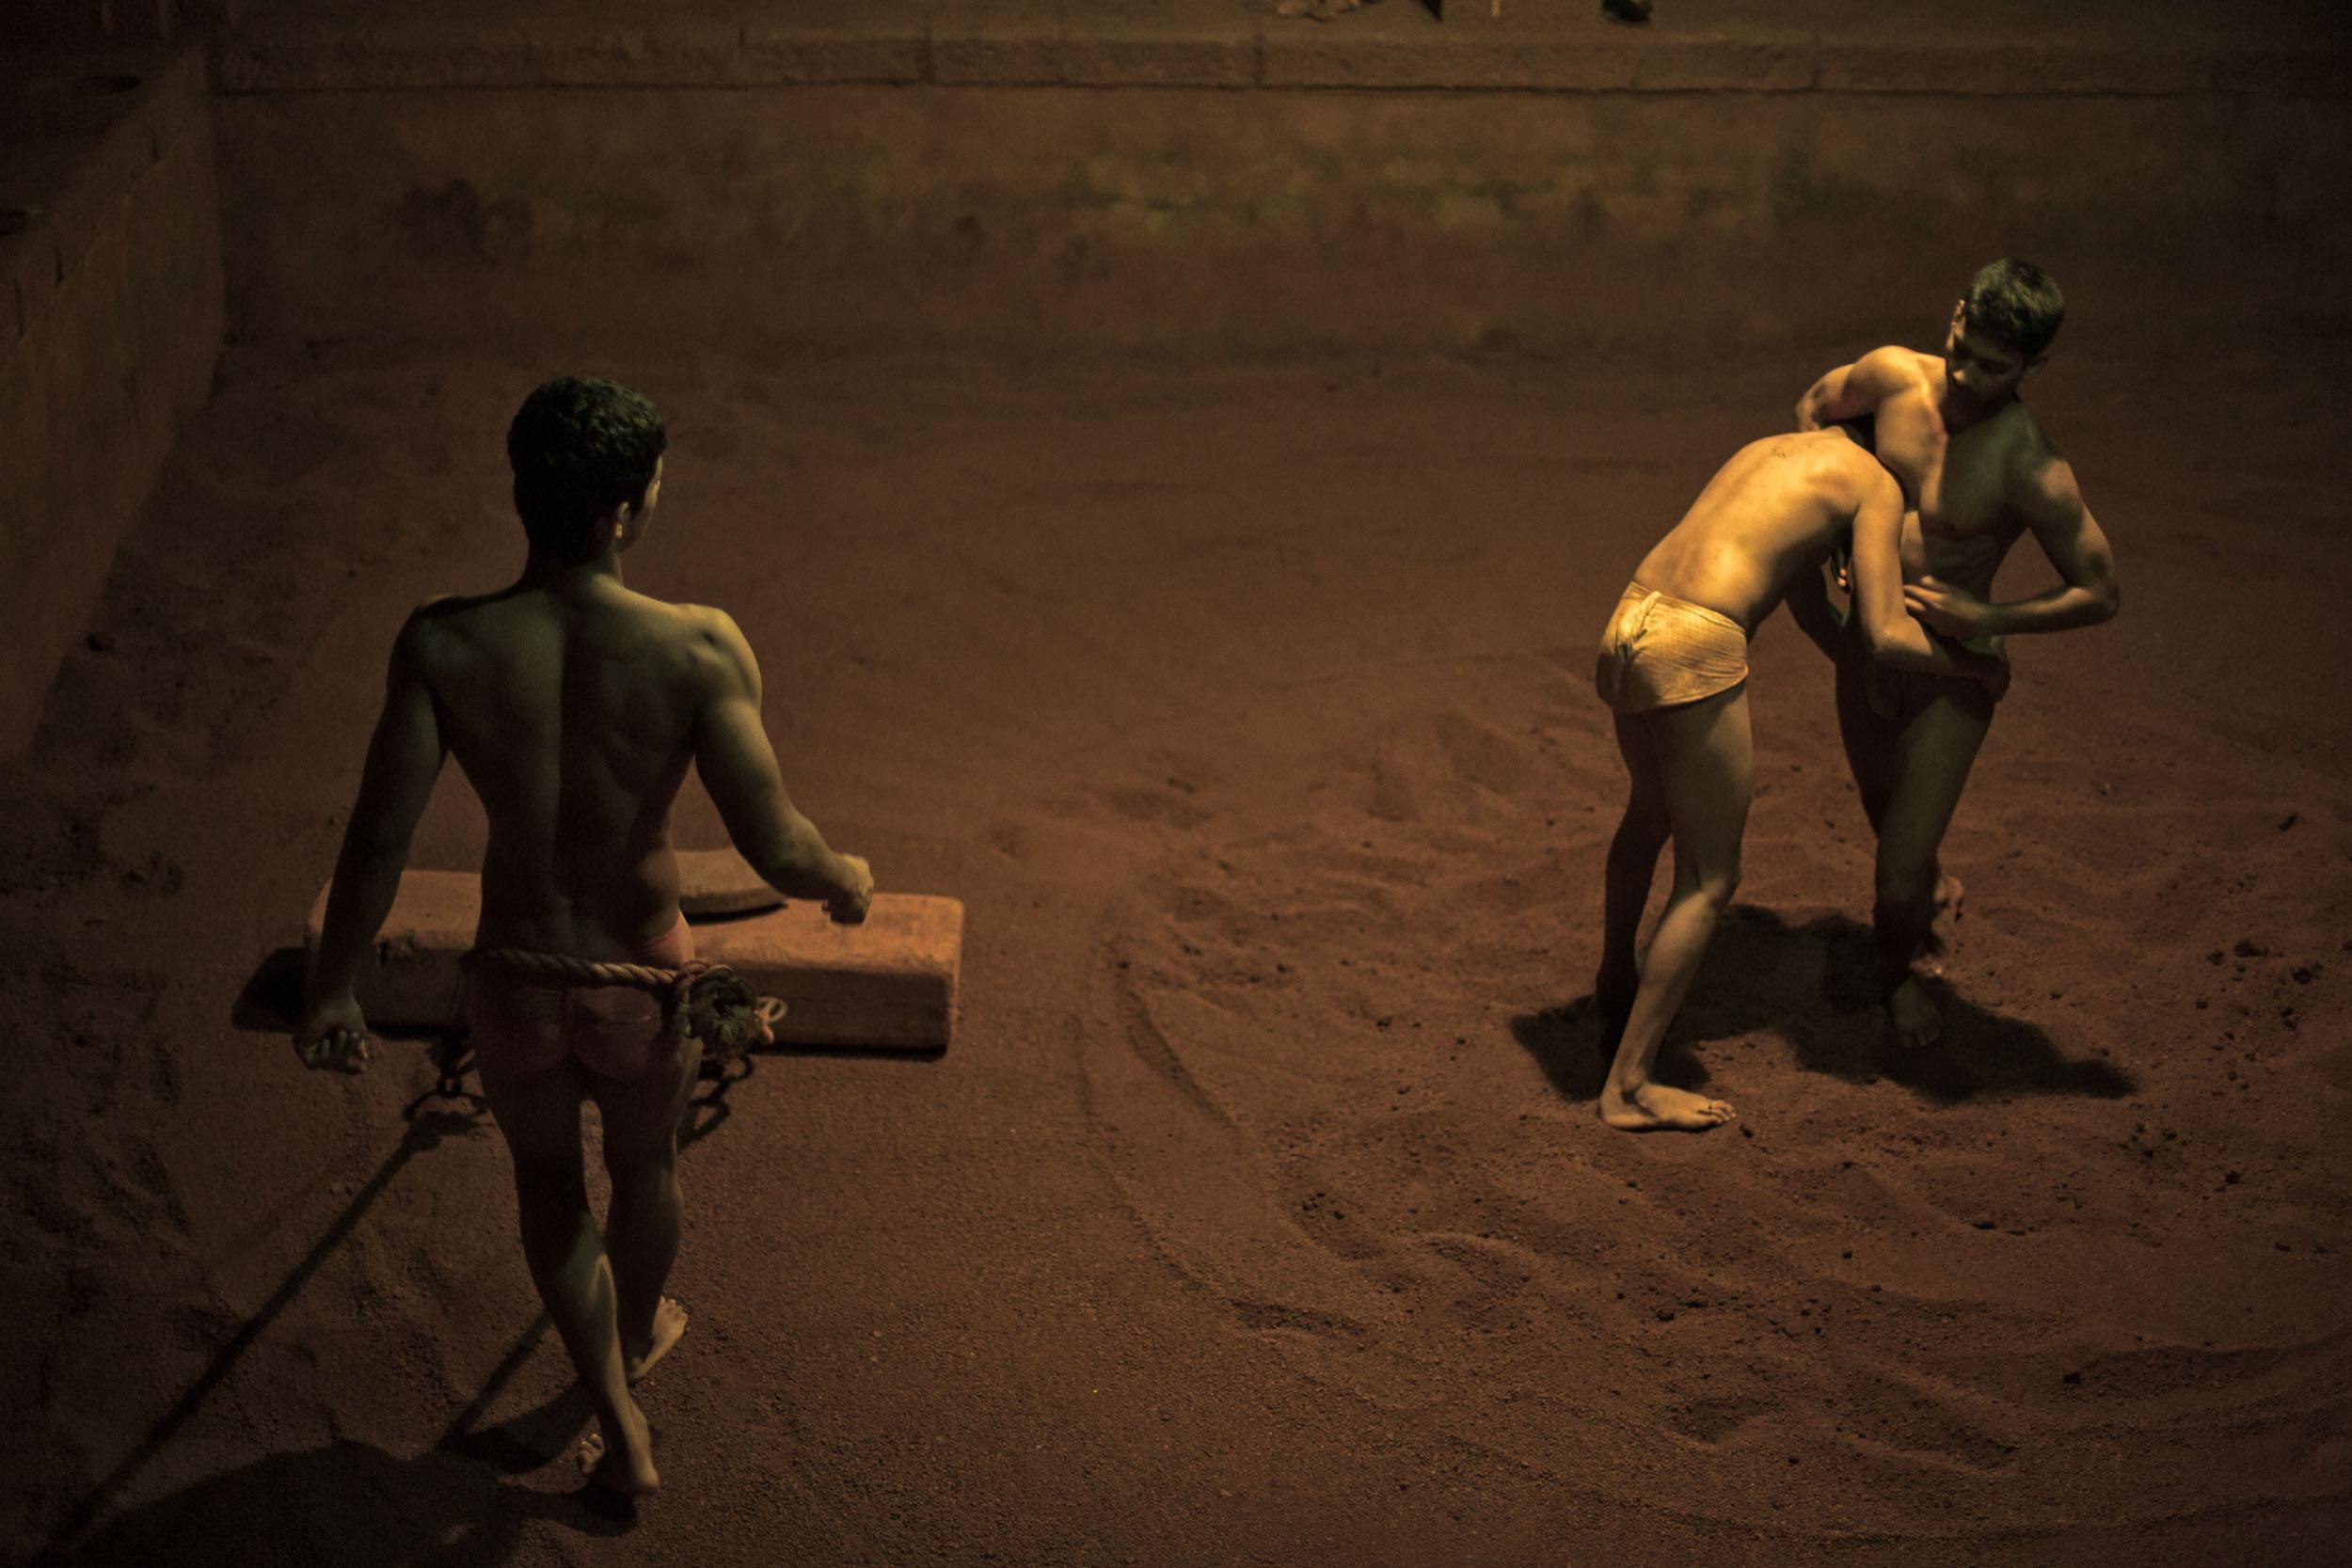 Sindhur_Photography_Travel_People_Wrestlers-1.JPG